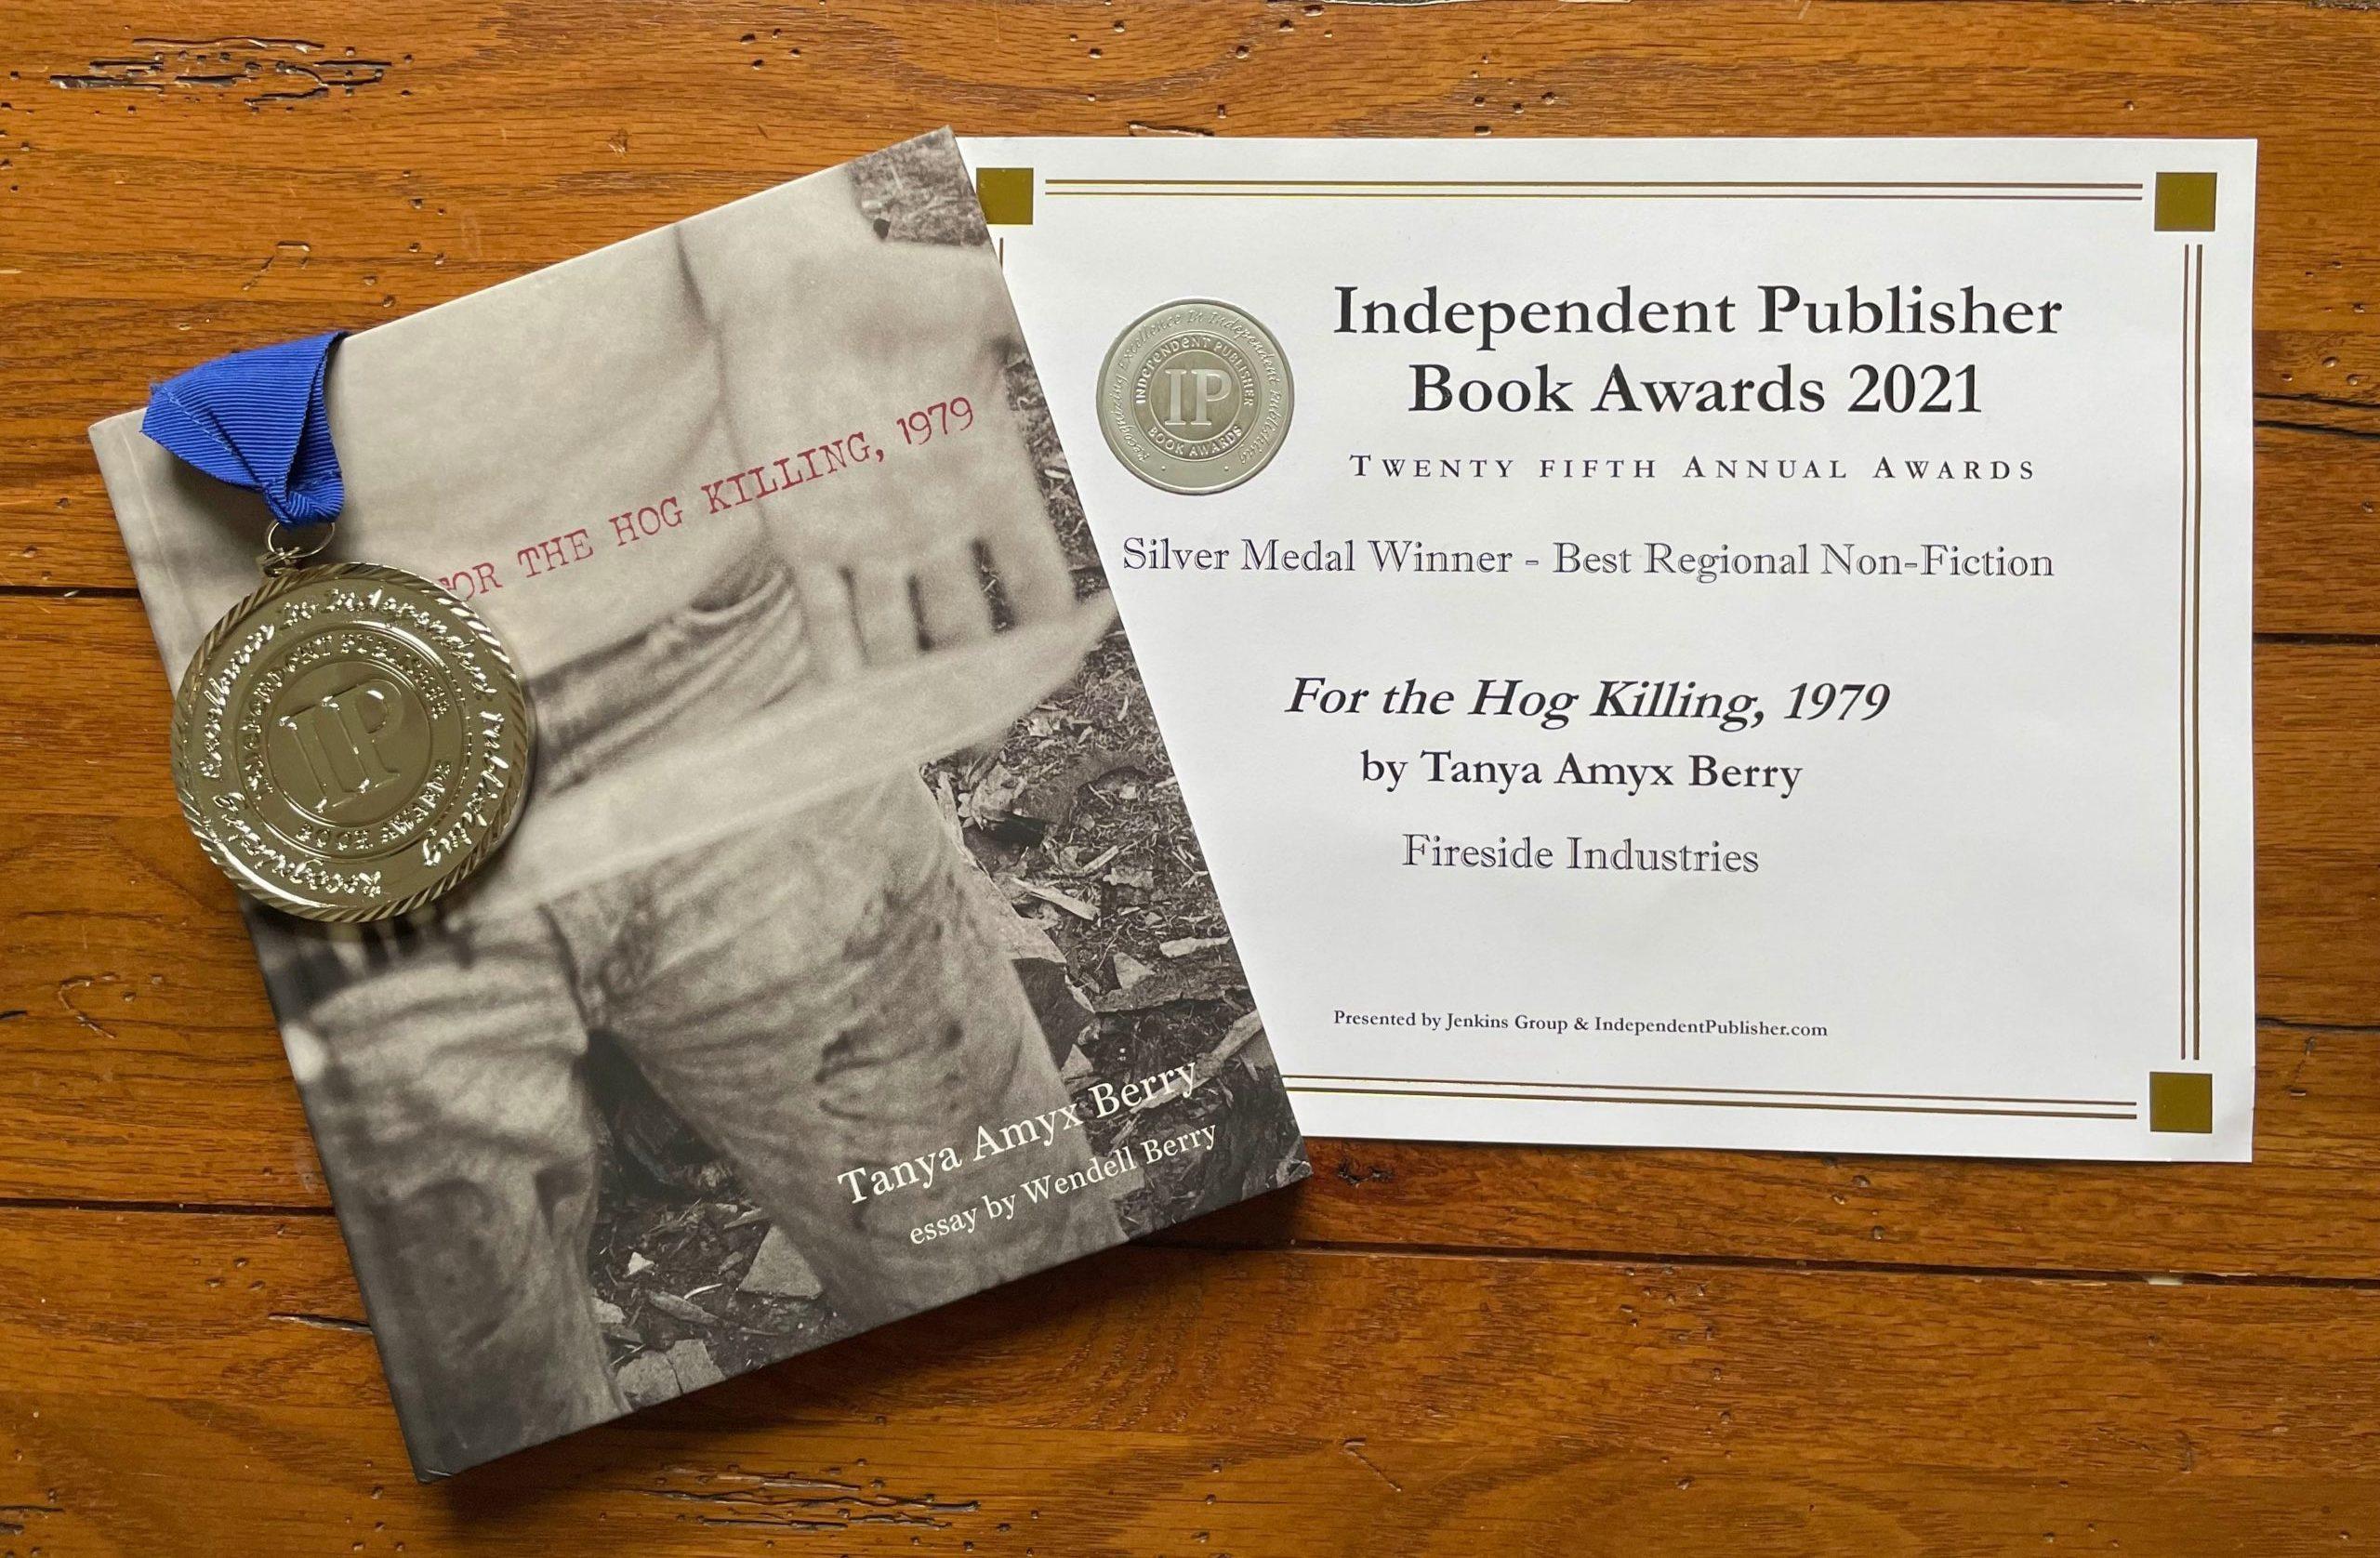 The Hog Killing Award